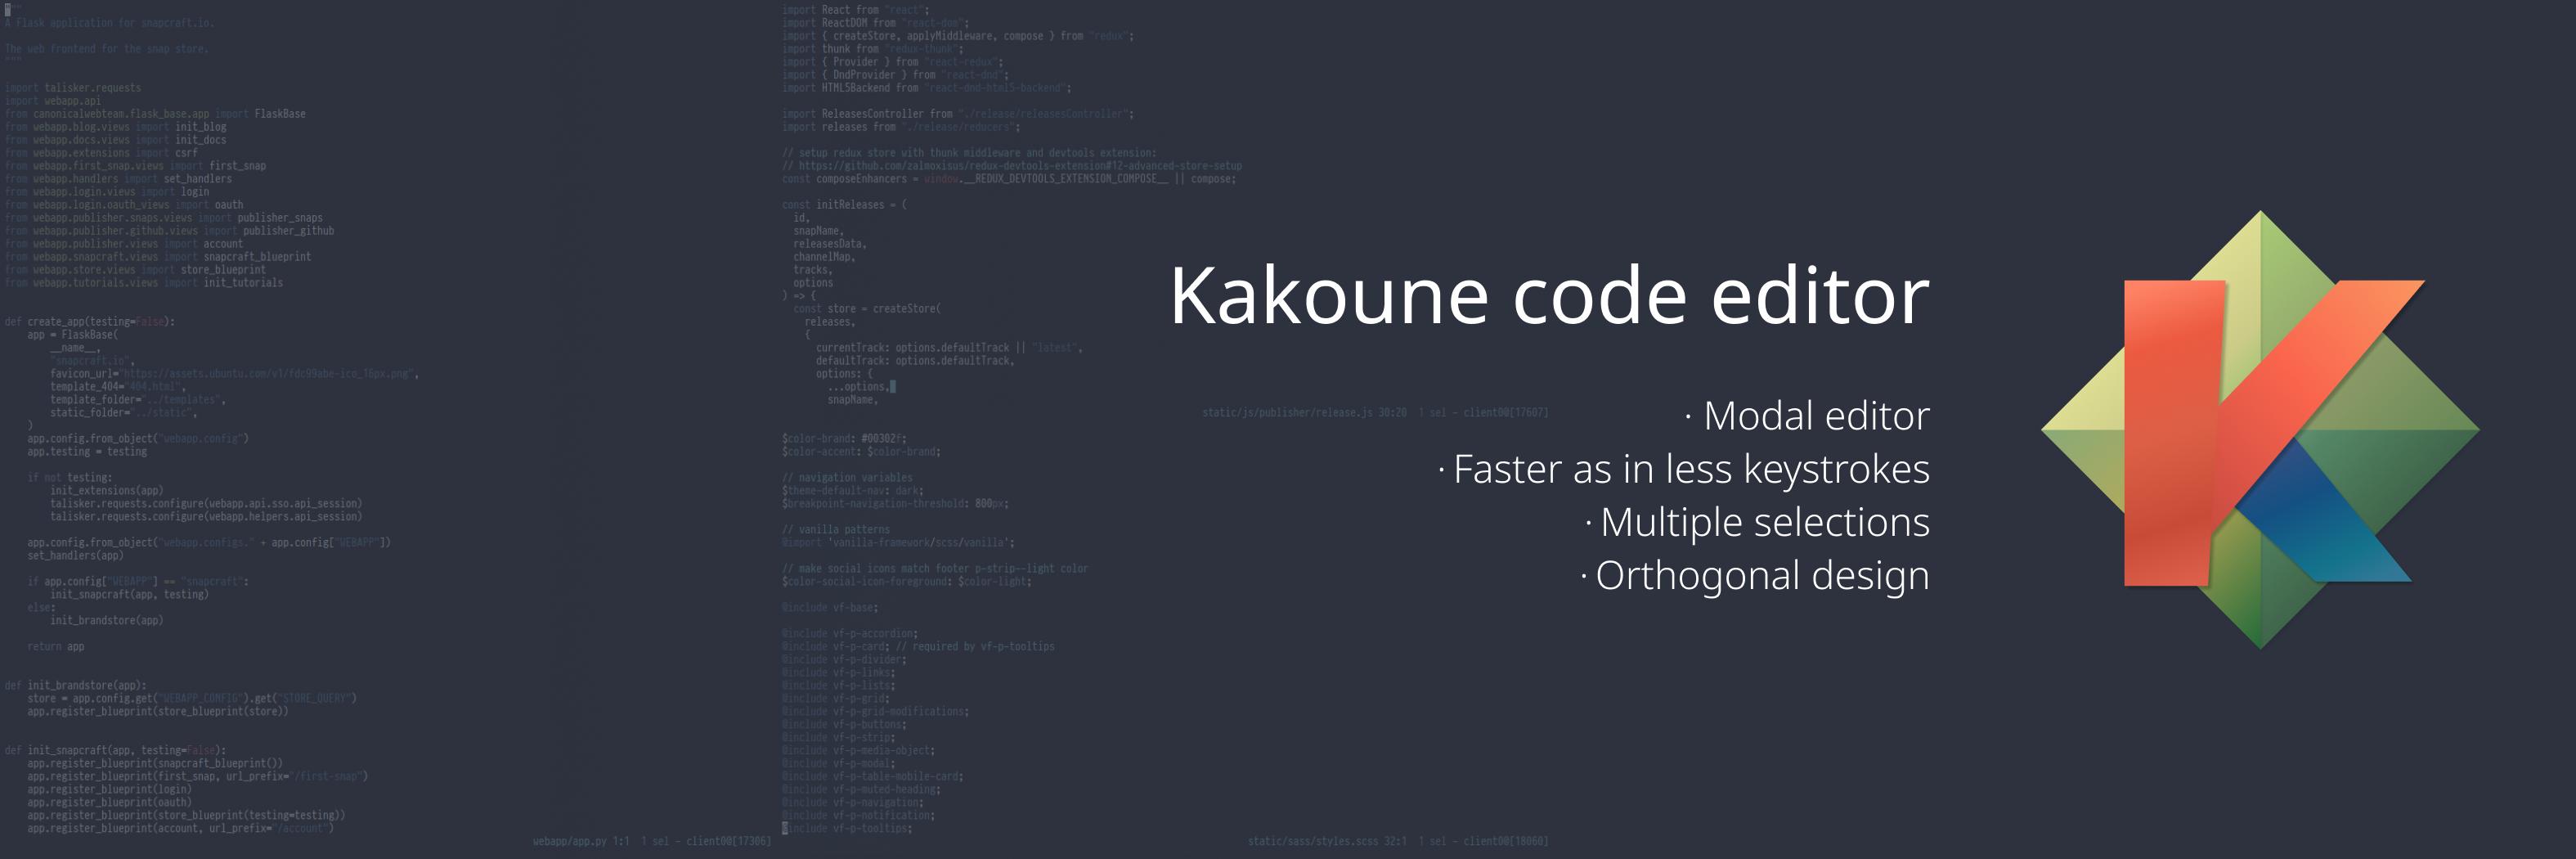 Kakoune code editor banner